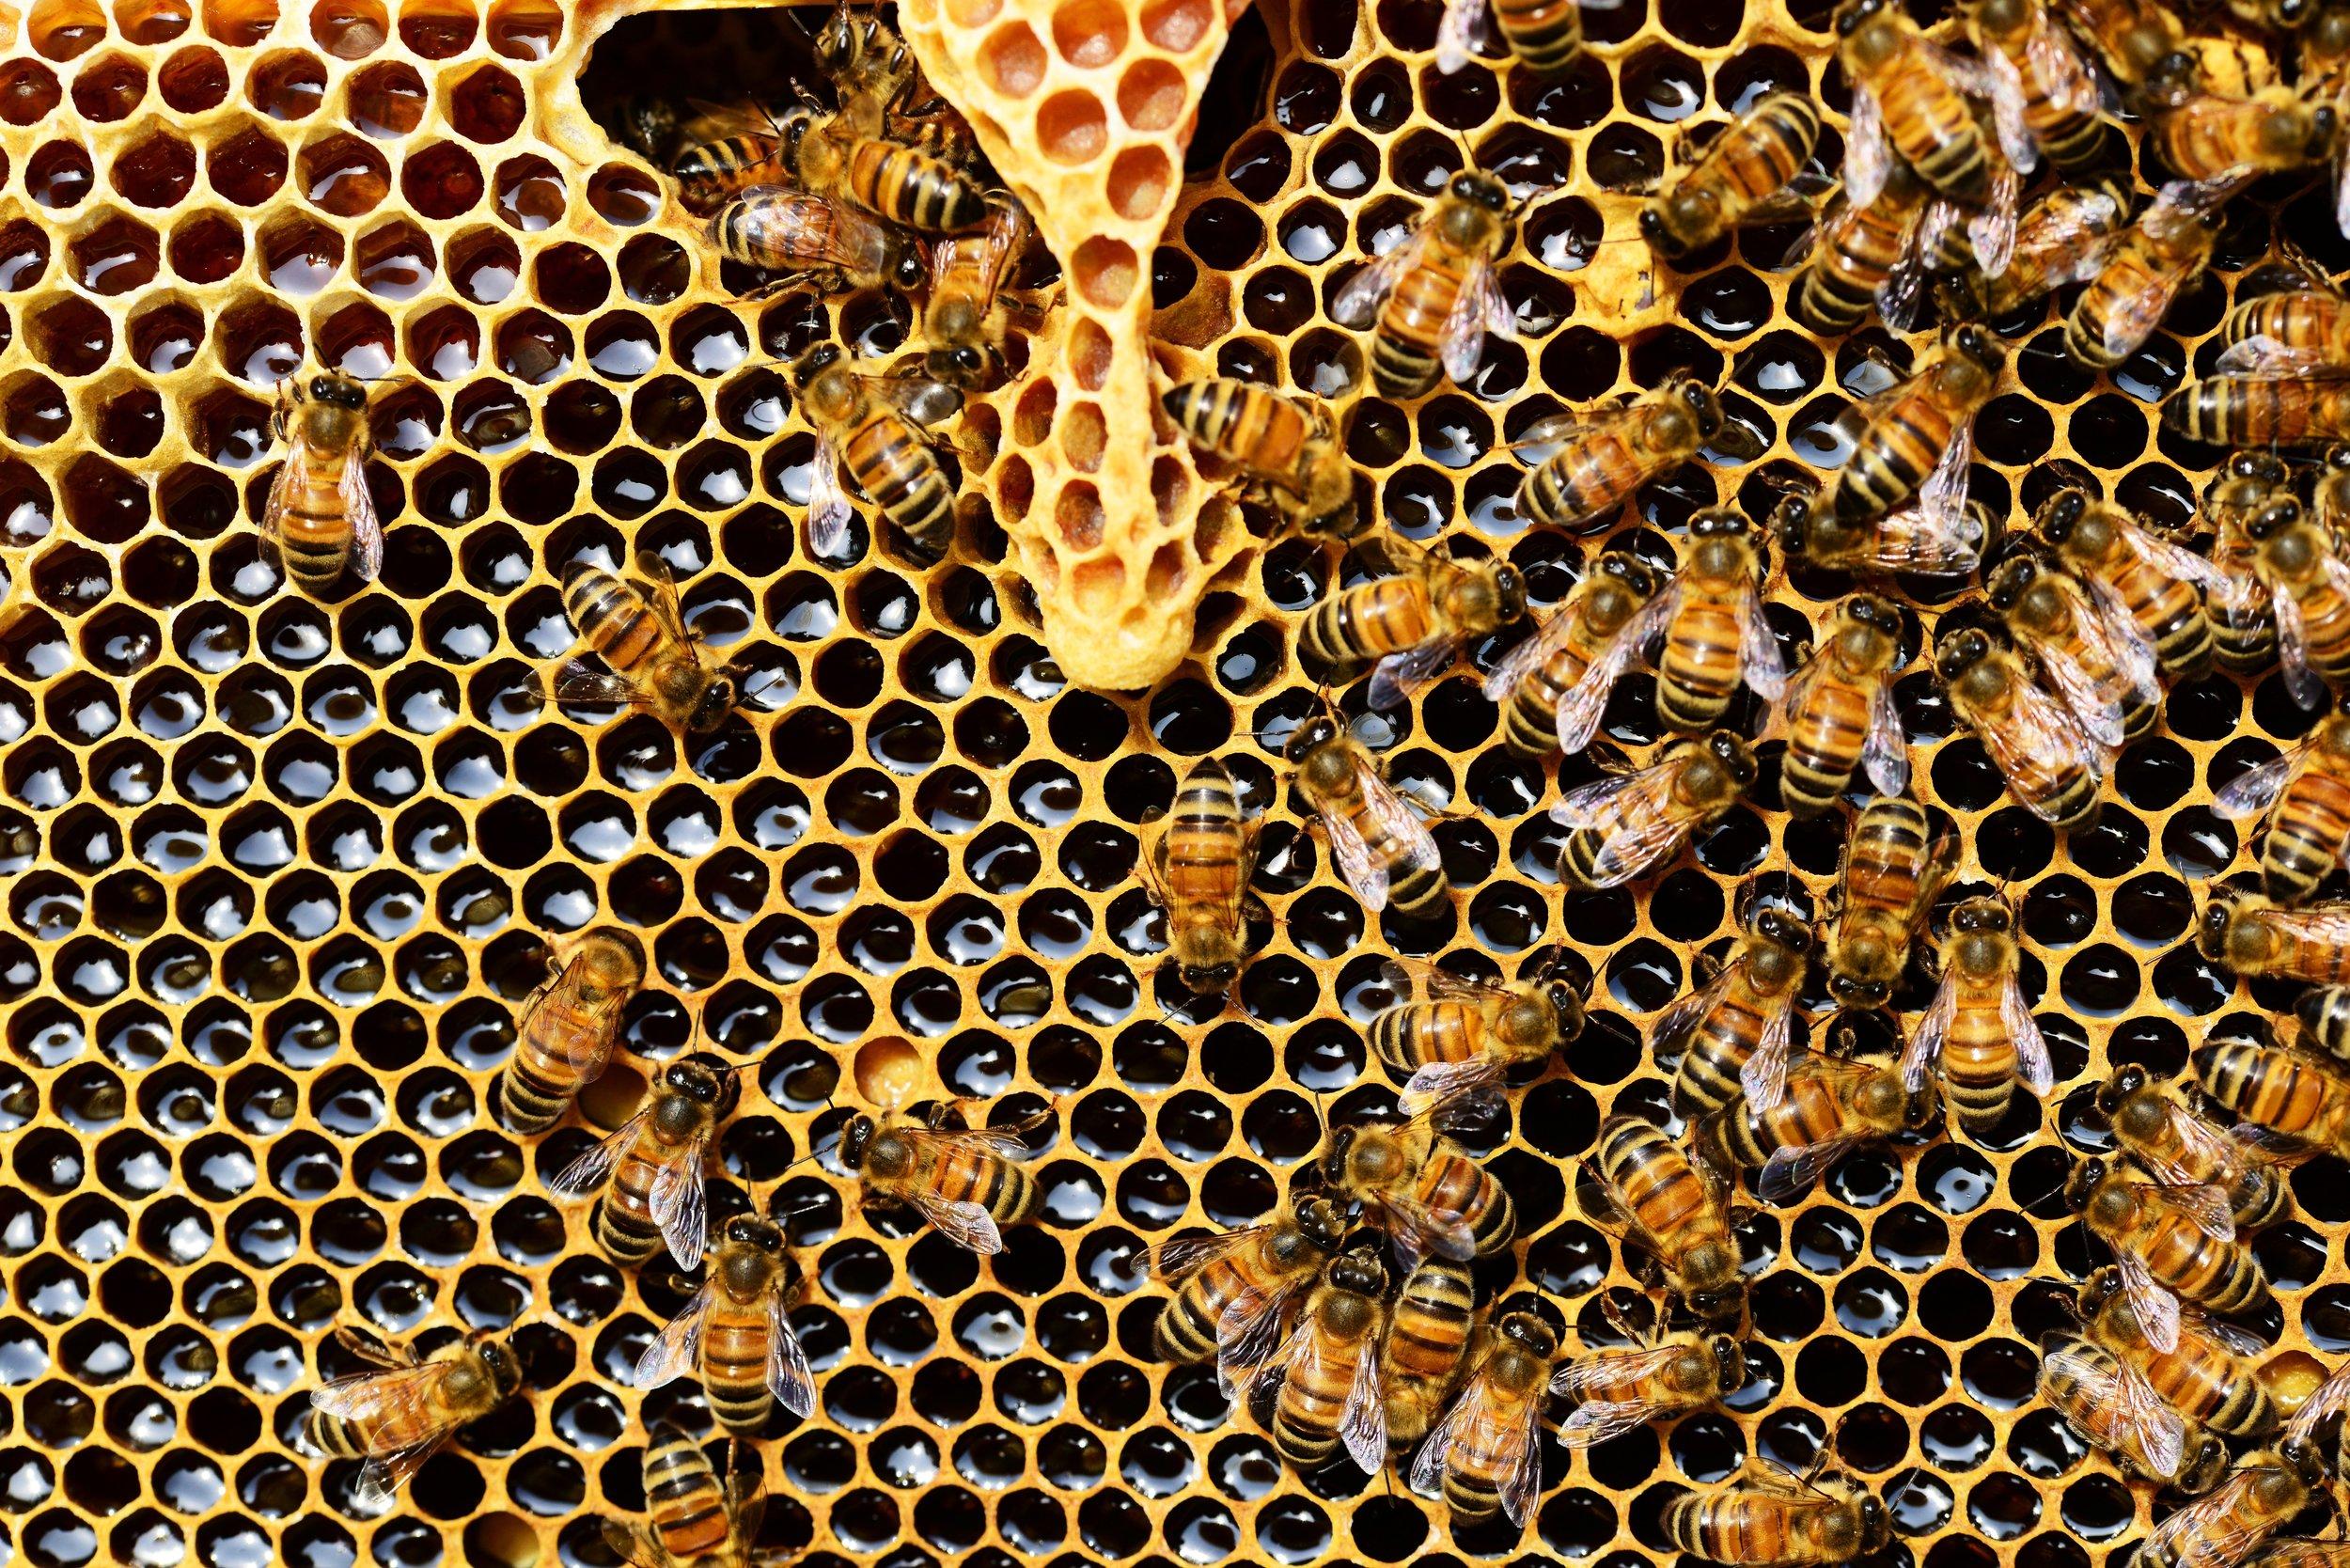 apis-mellifera-bee-beehive-56876.jpg